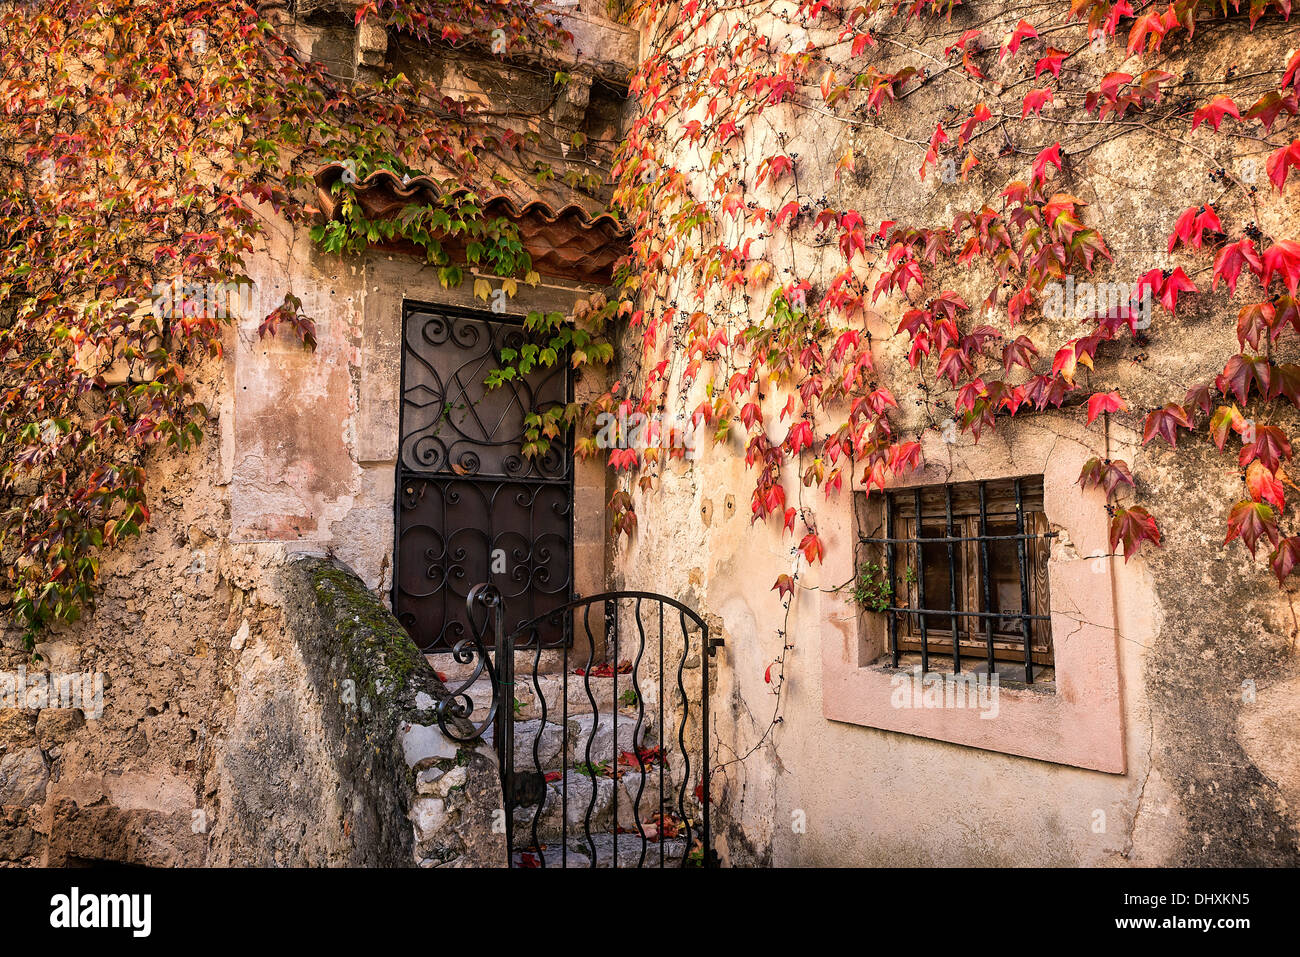 Charmante rustikale Fassade und Efeu, Eza, Cote d ' Azur, Frankreich Stockbild